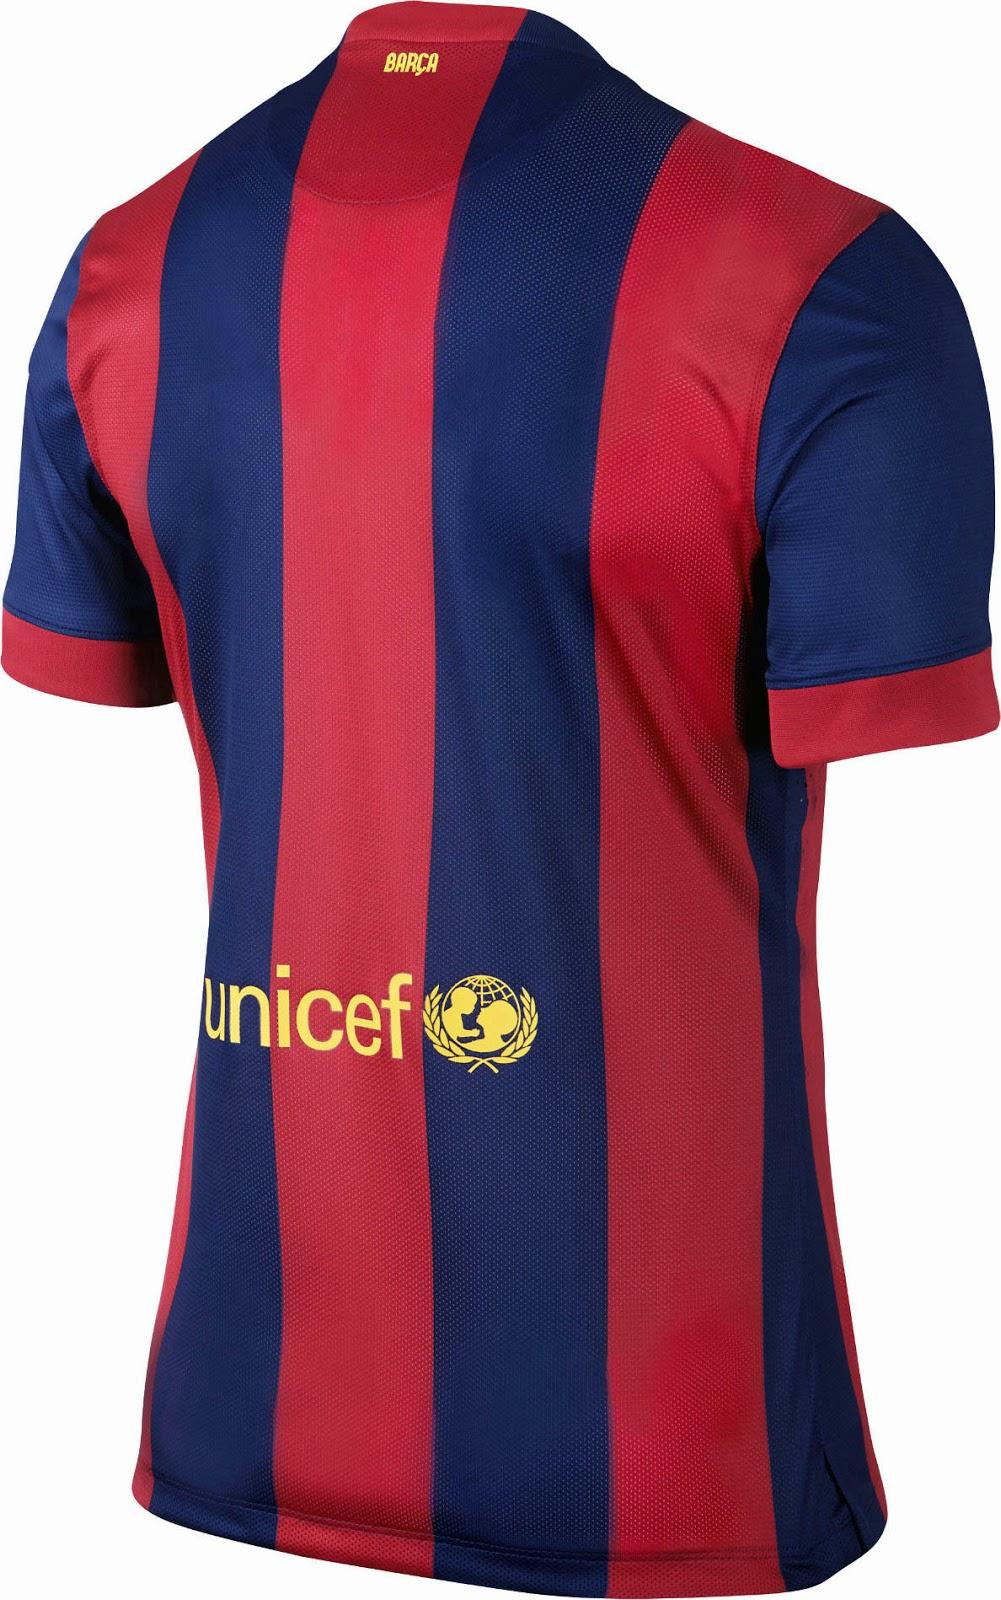 FC Barcelona 14-15 (2014-15) Home, Away And Third Kits